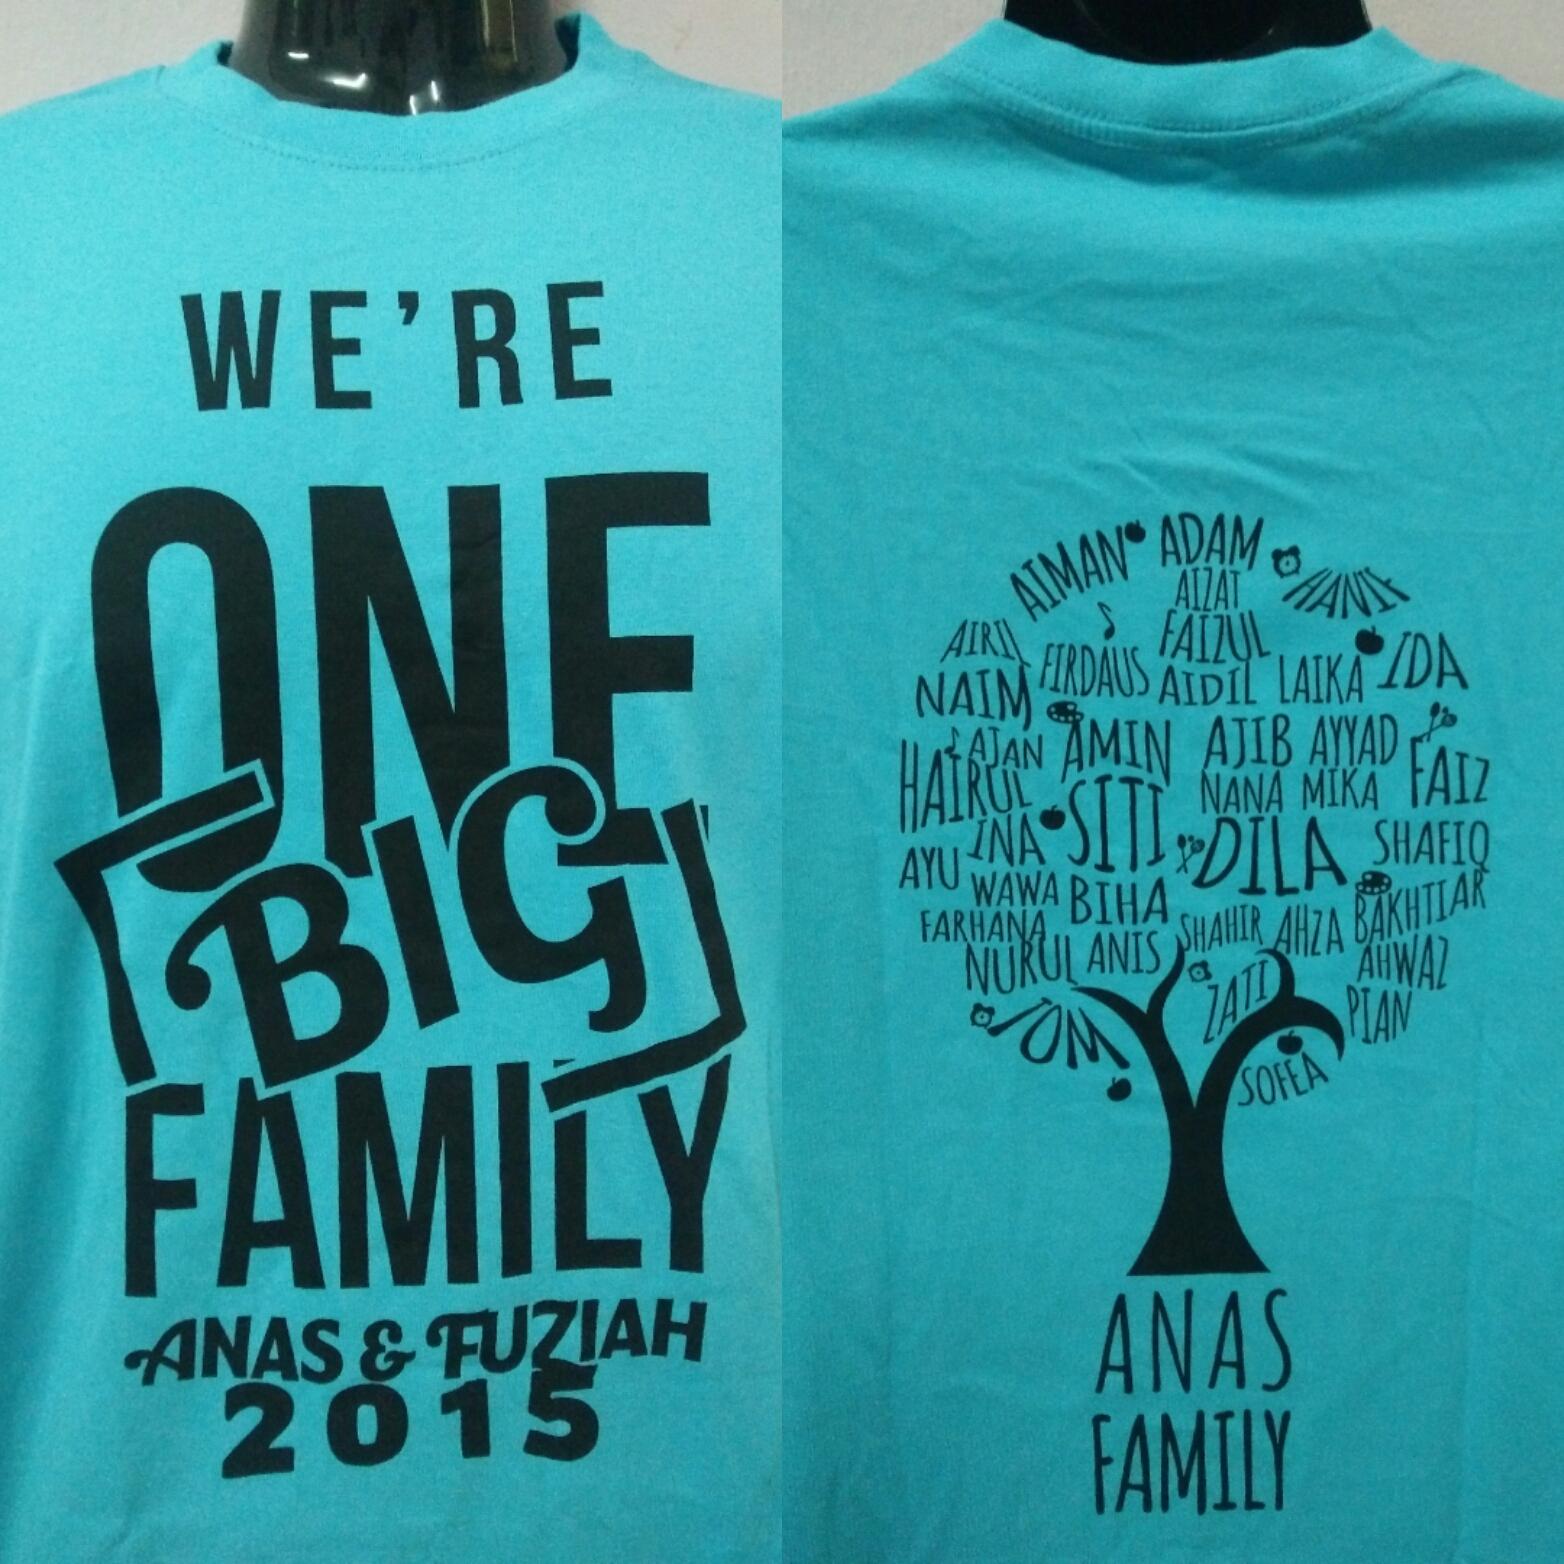 Design t shirt rewang - Hubungi Kami Sekarang 0132850982 Call Whatsapp